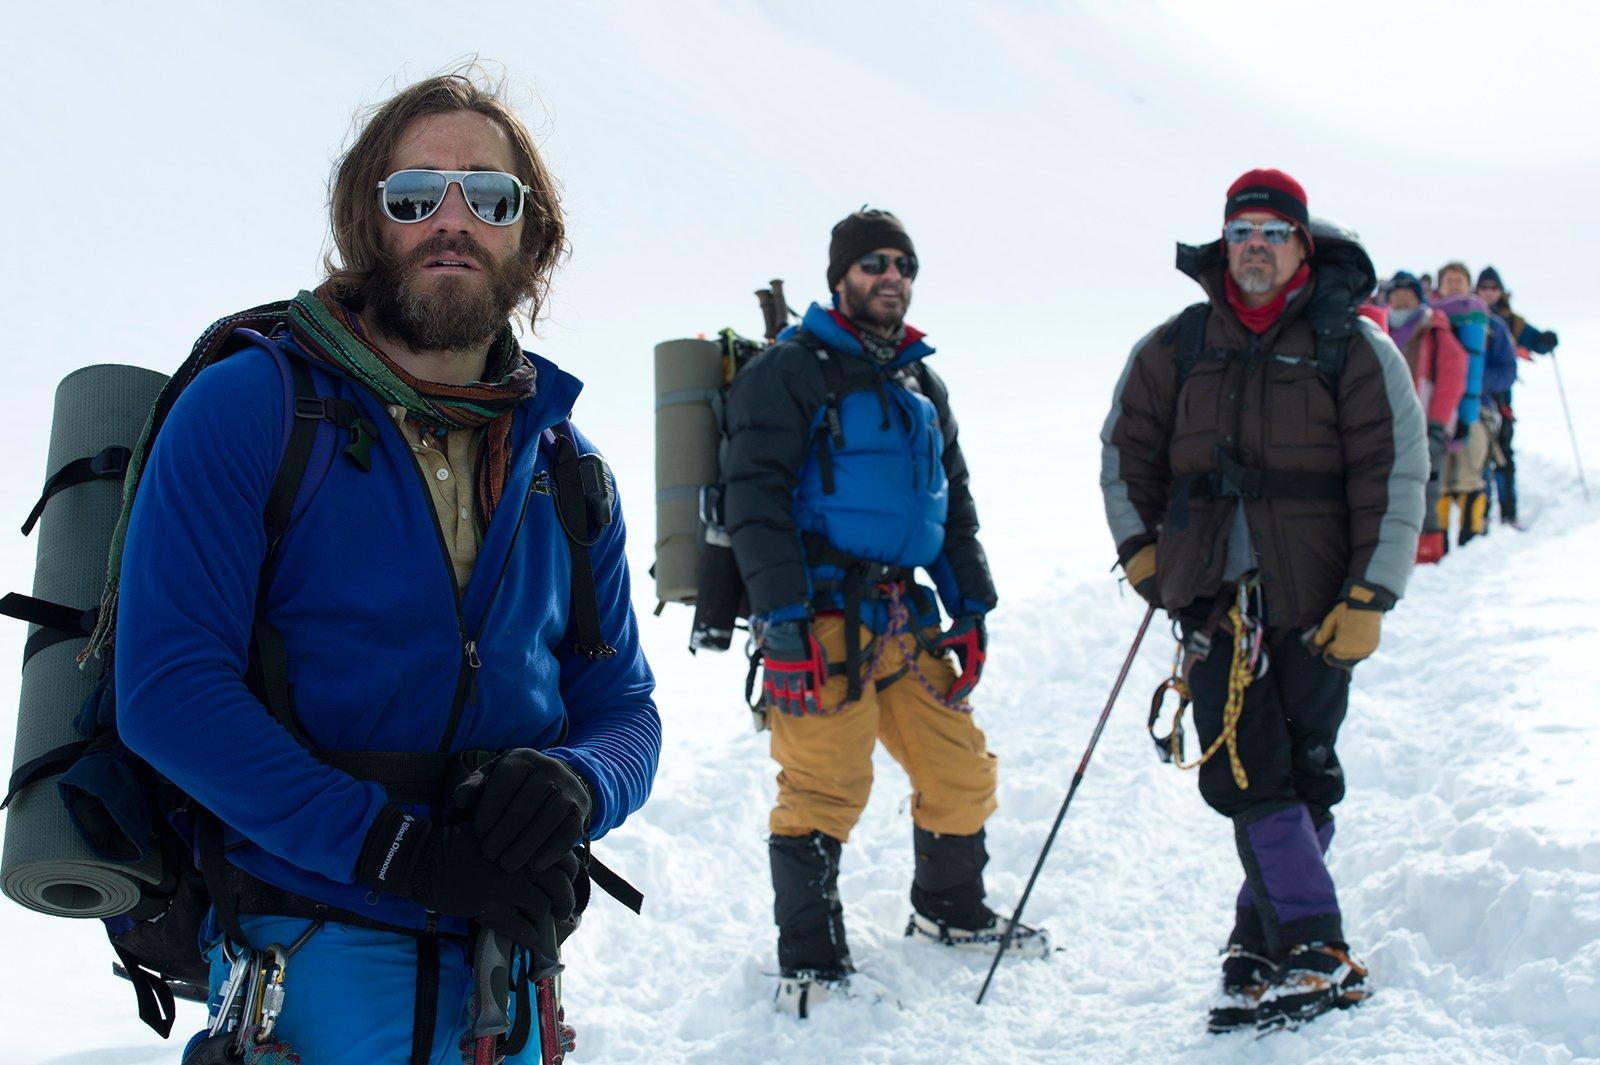 Lunette glacier haute montagne